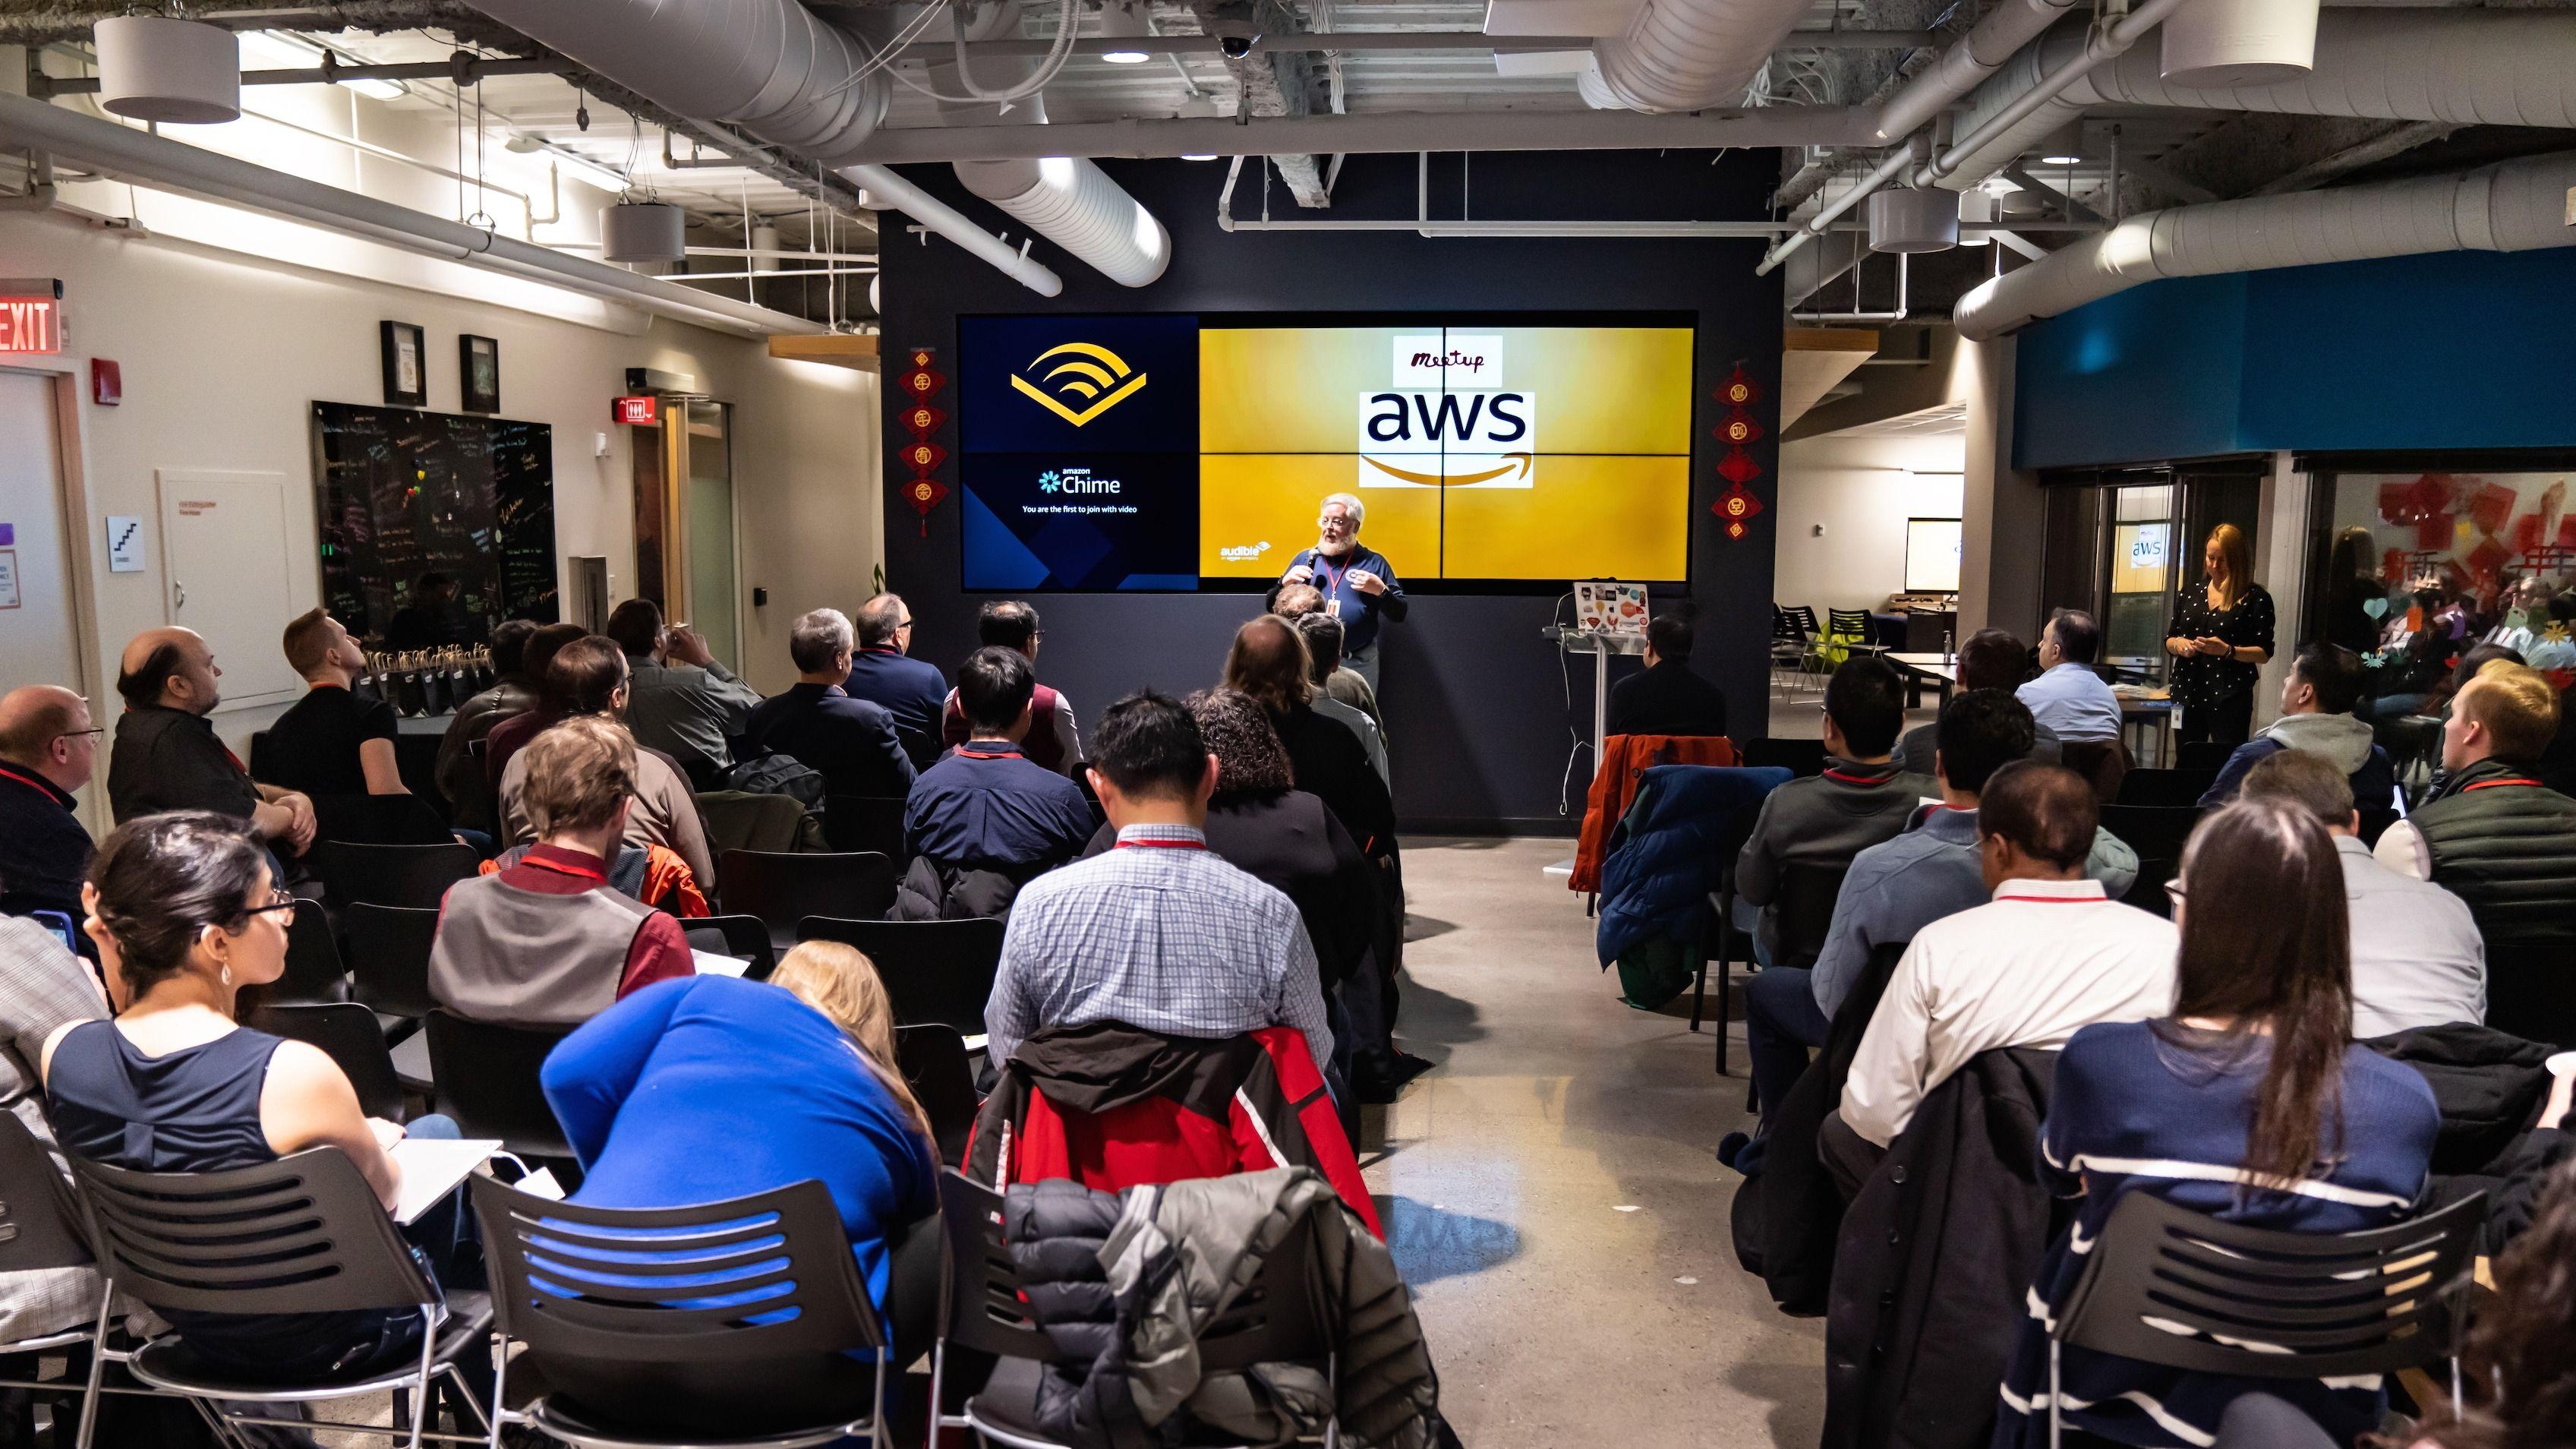 The Boston Amazon Web Services Meetup Group